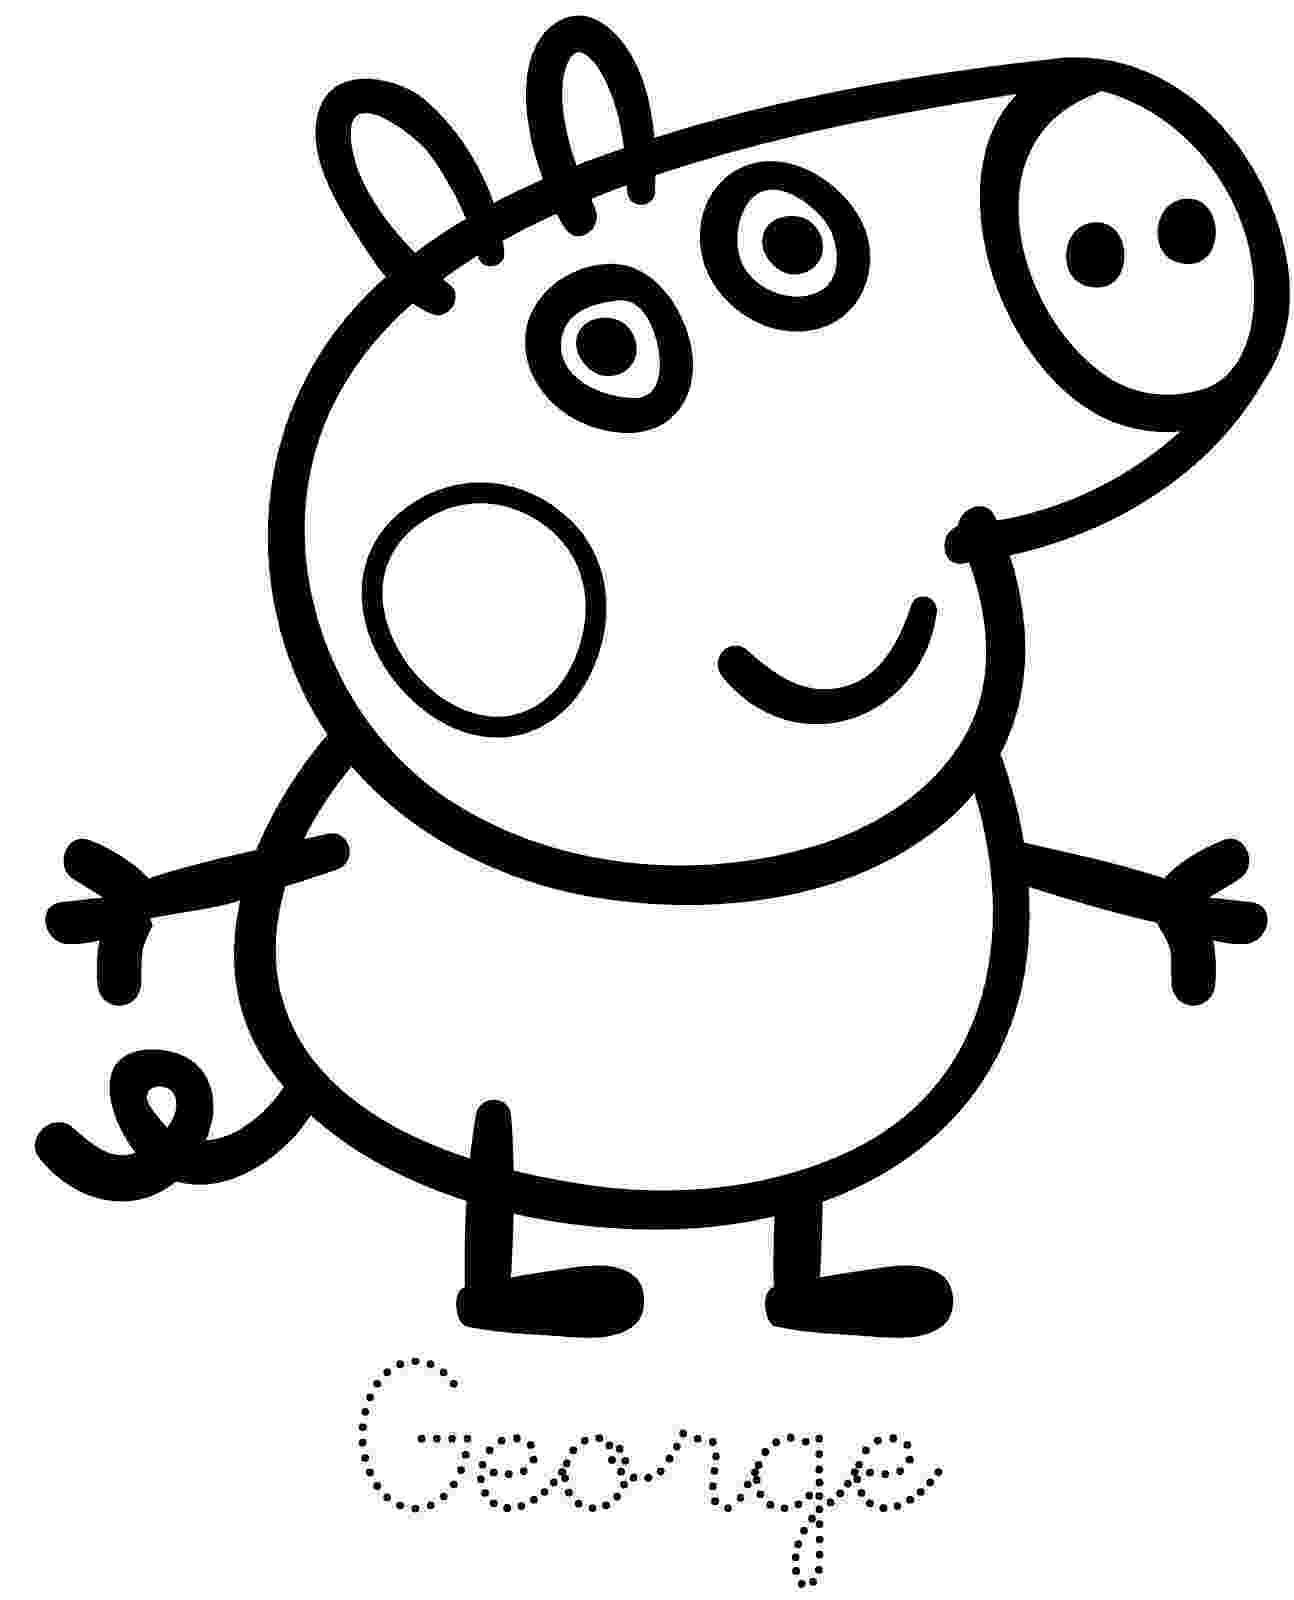 peppa pig colouring printables peppa pig coloring pages pig colouring printables peppa